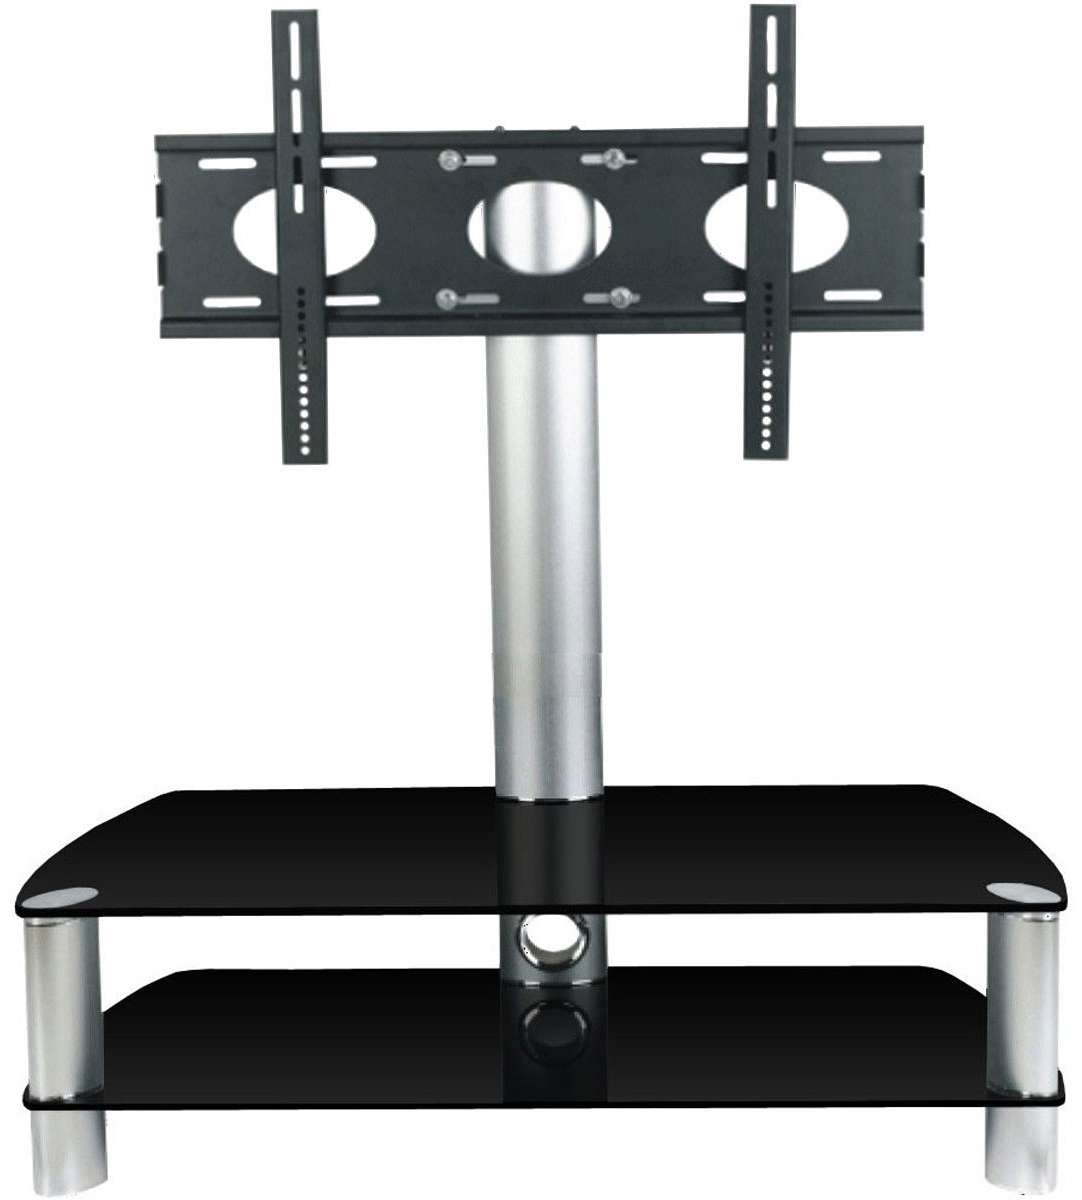 Stil Stand Stuk 2053chbl Tv Stands Inside Swivel Black Glass Tv Stands (View 13 of 15)